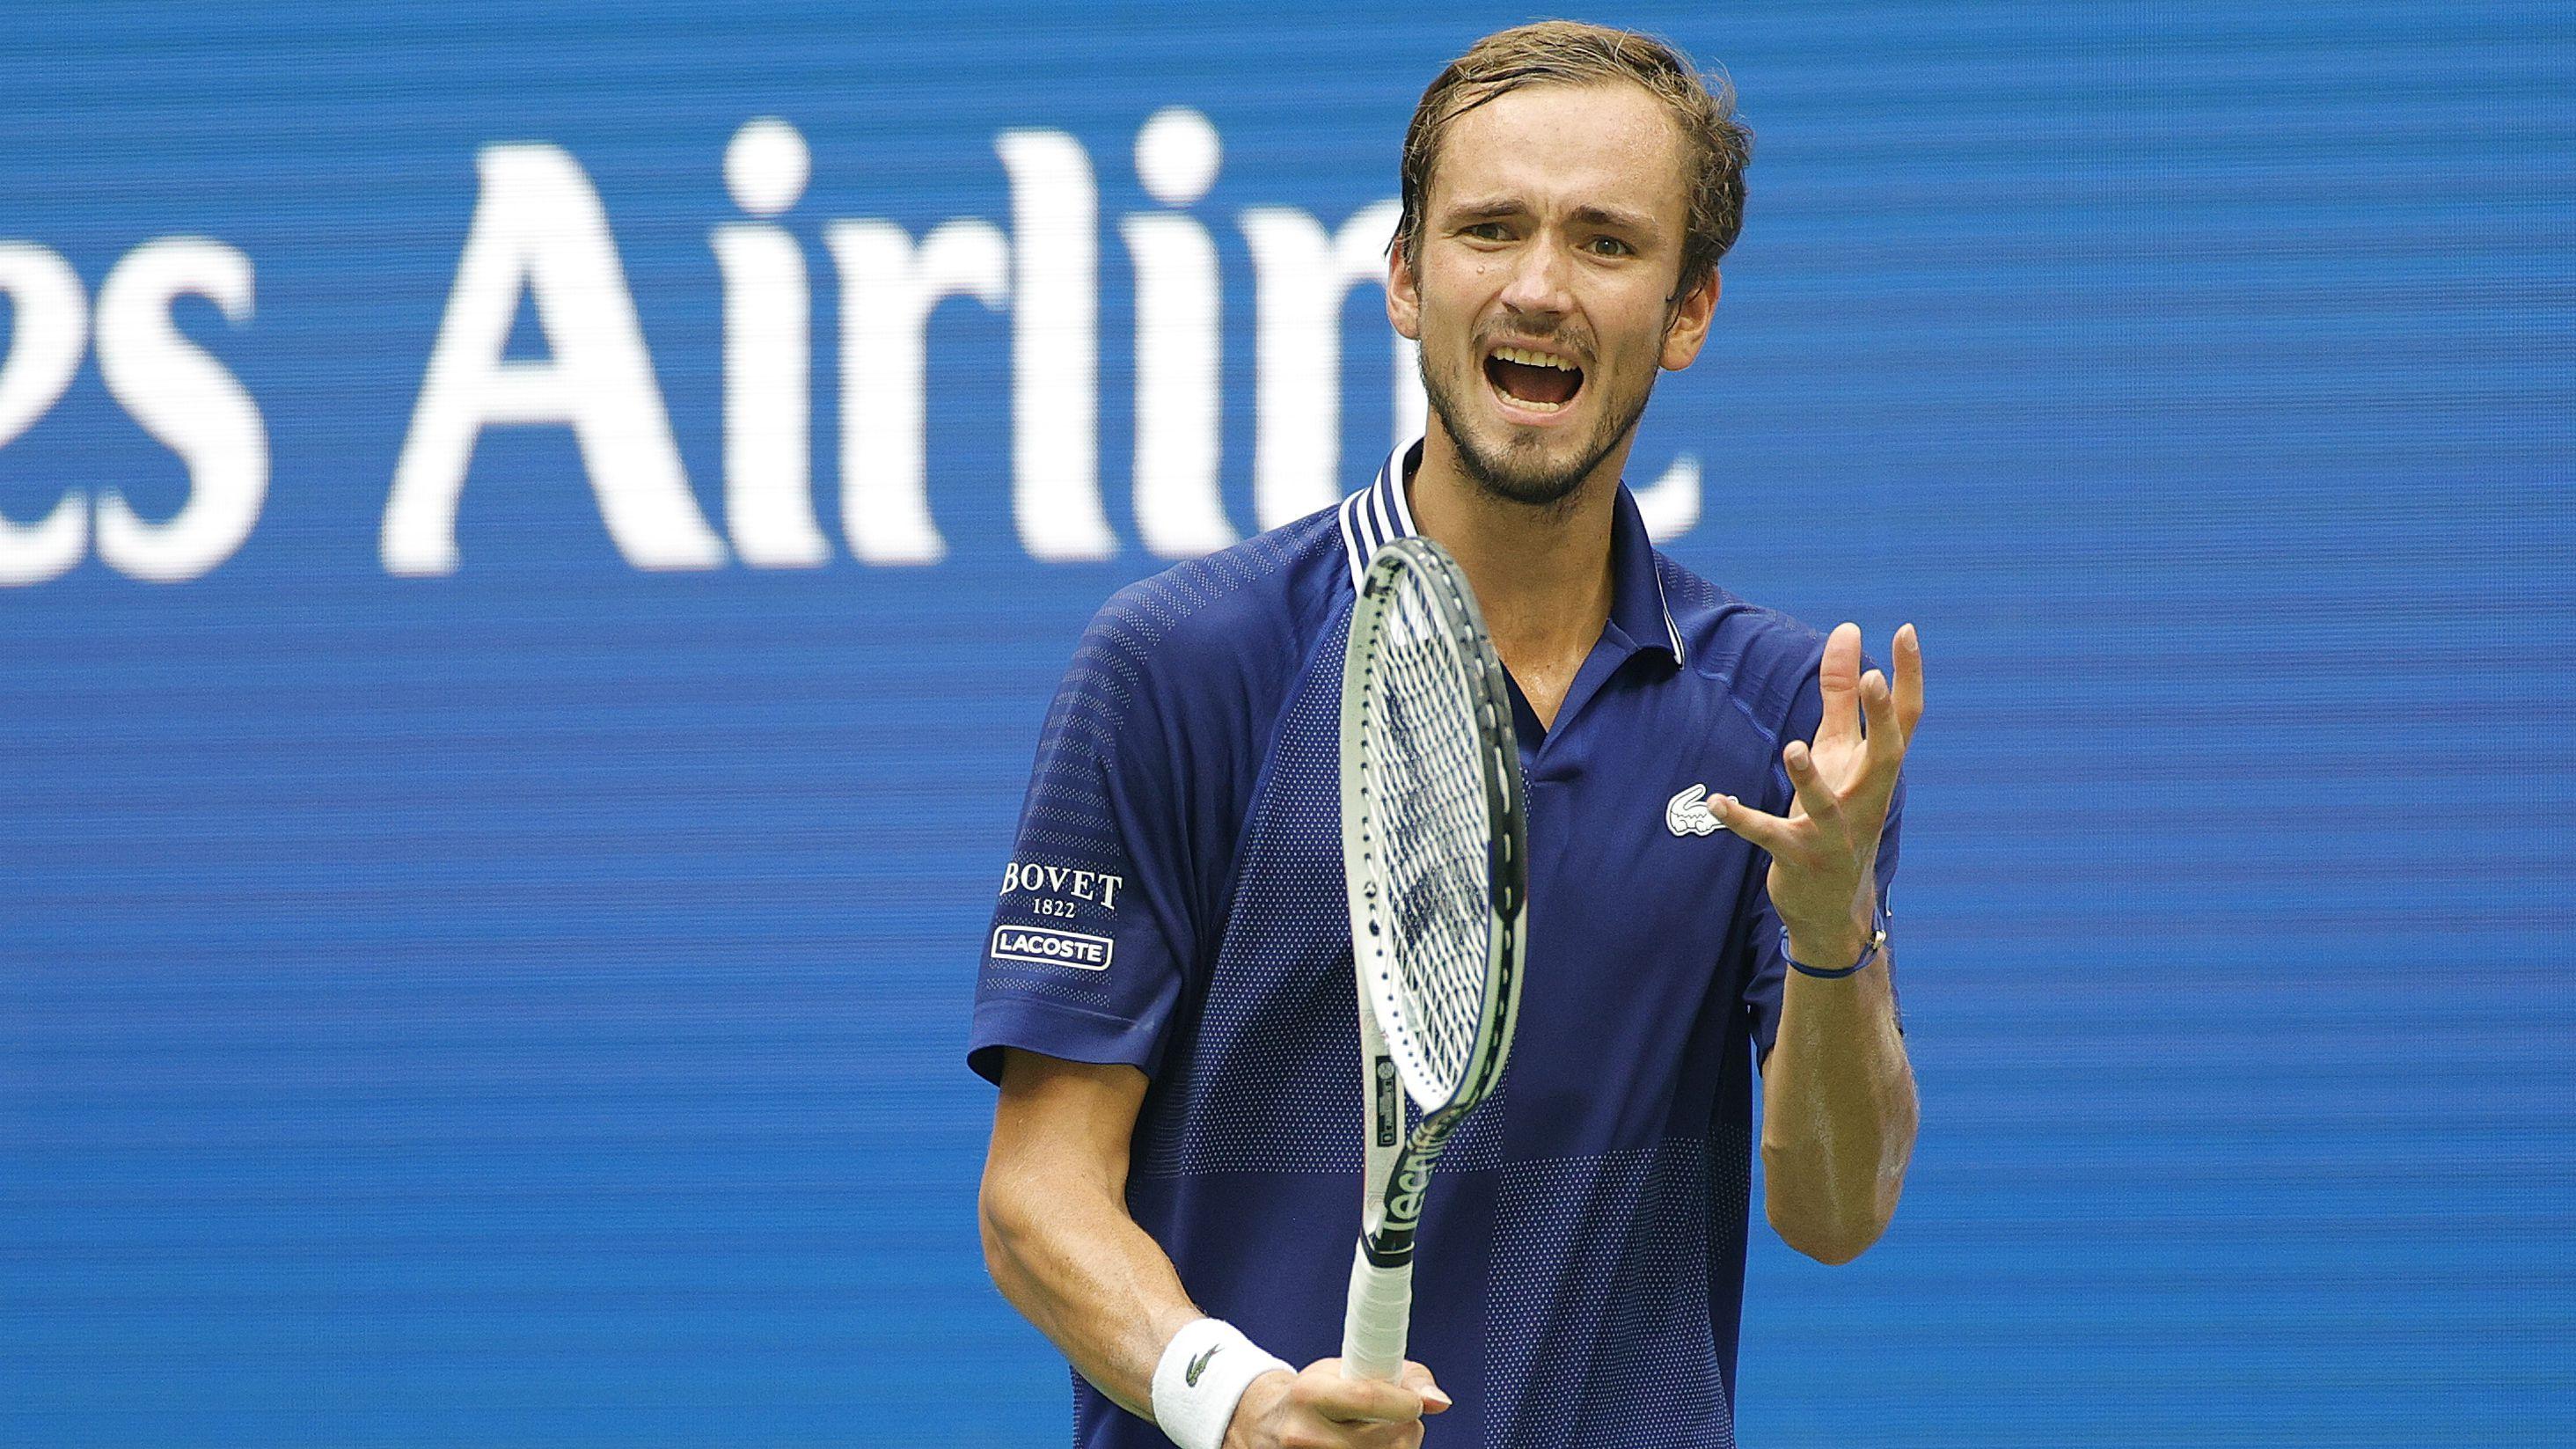 US Open crowd slammed for booing Daniil Medvedev on championship points